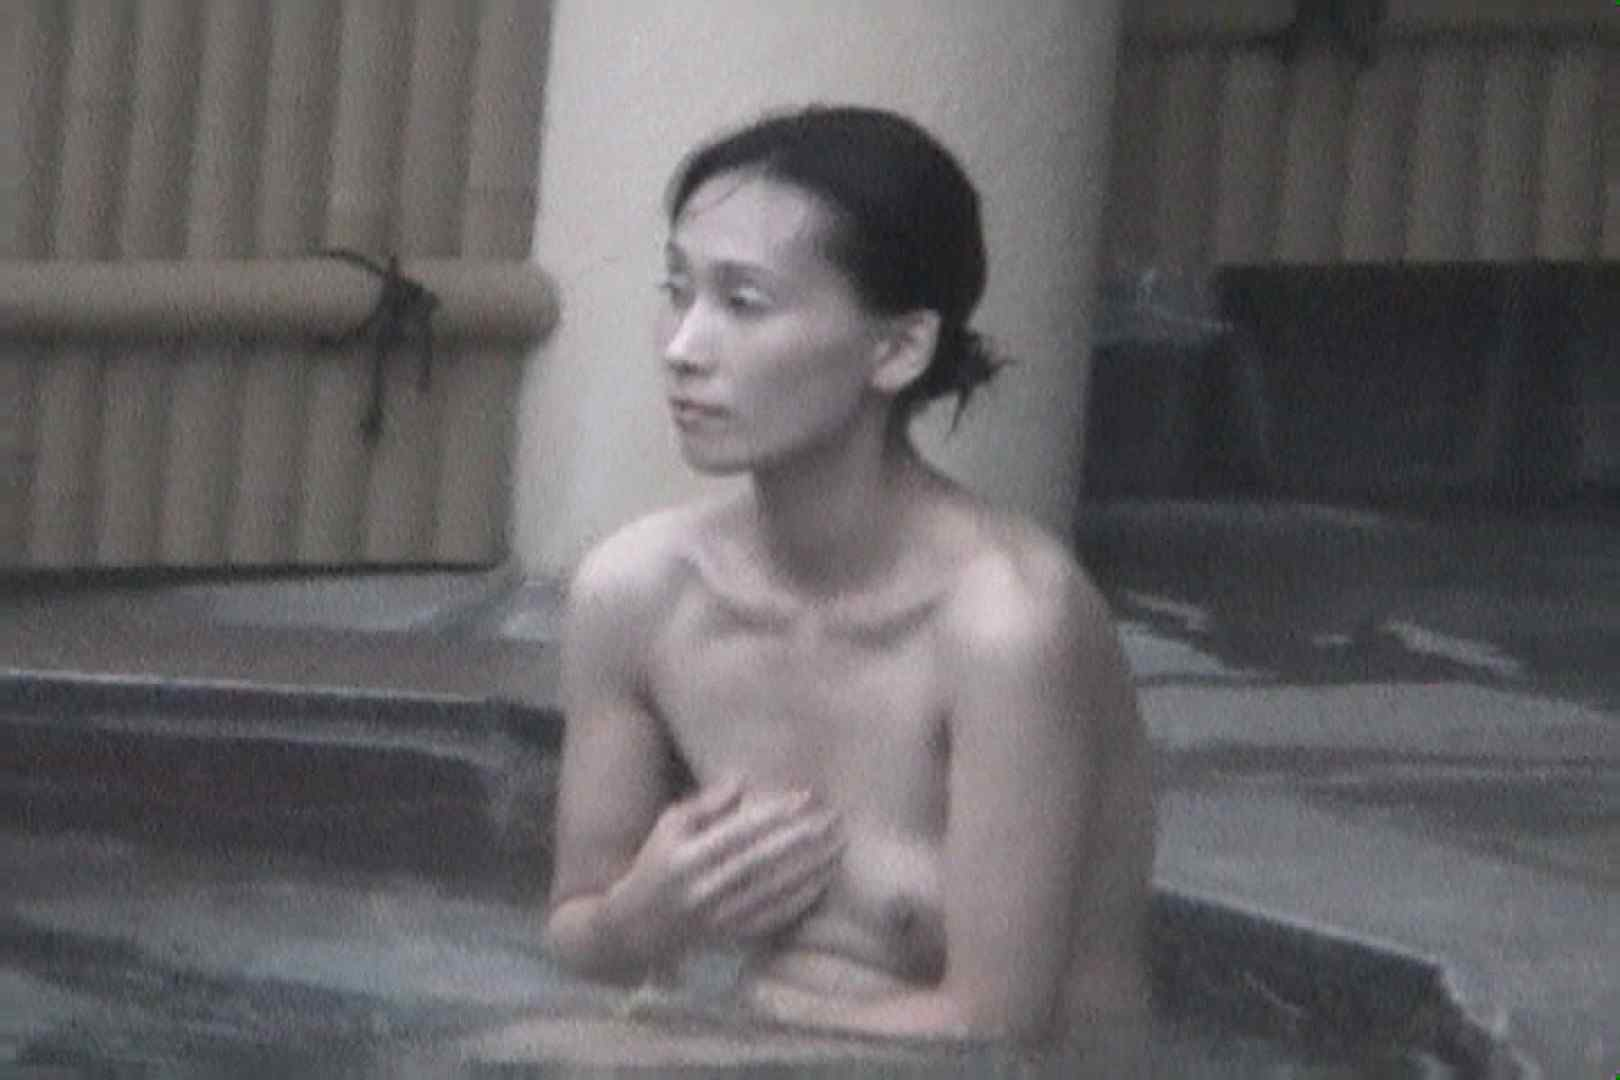 Aquaな露天風呂Vol.557 露天風呂編 | 盗撮シリーズ  100PIX 7